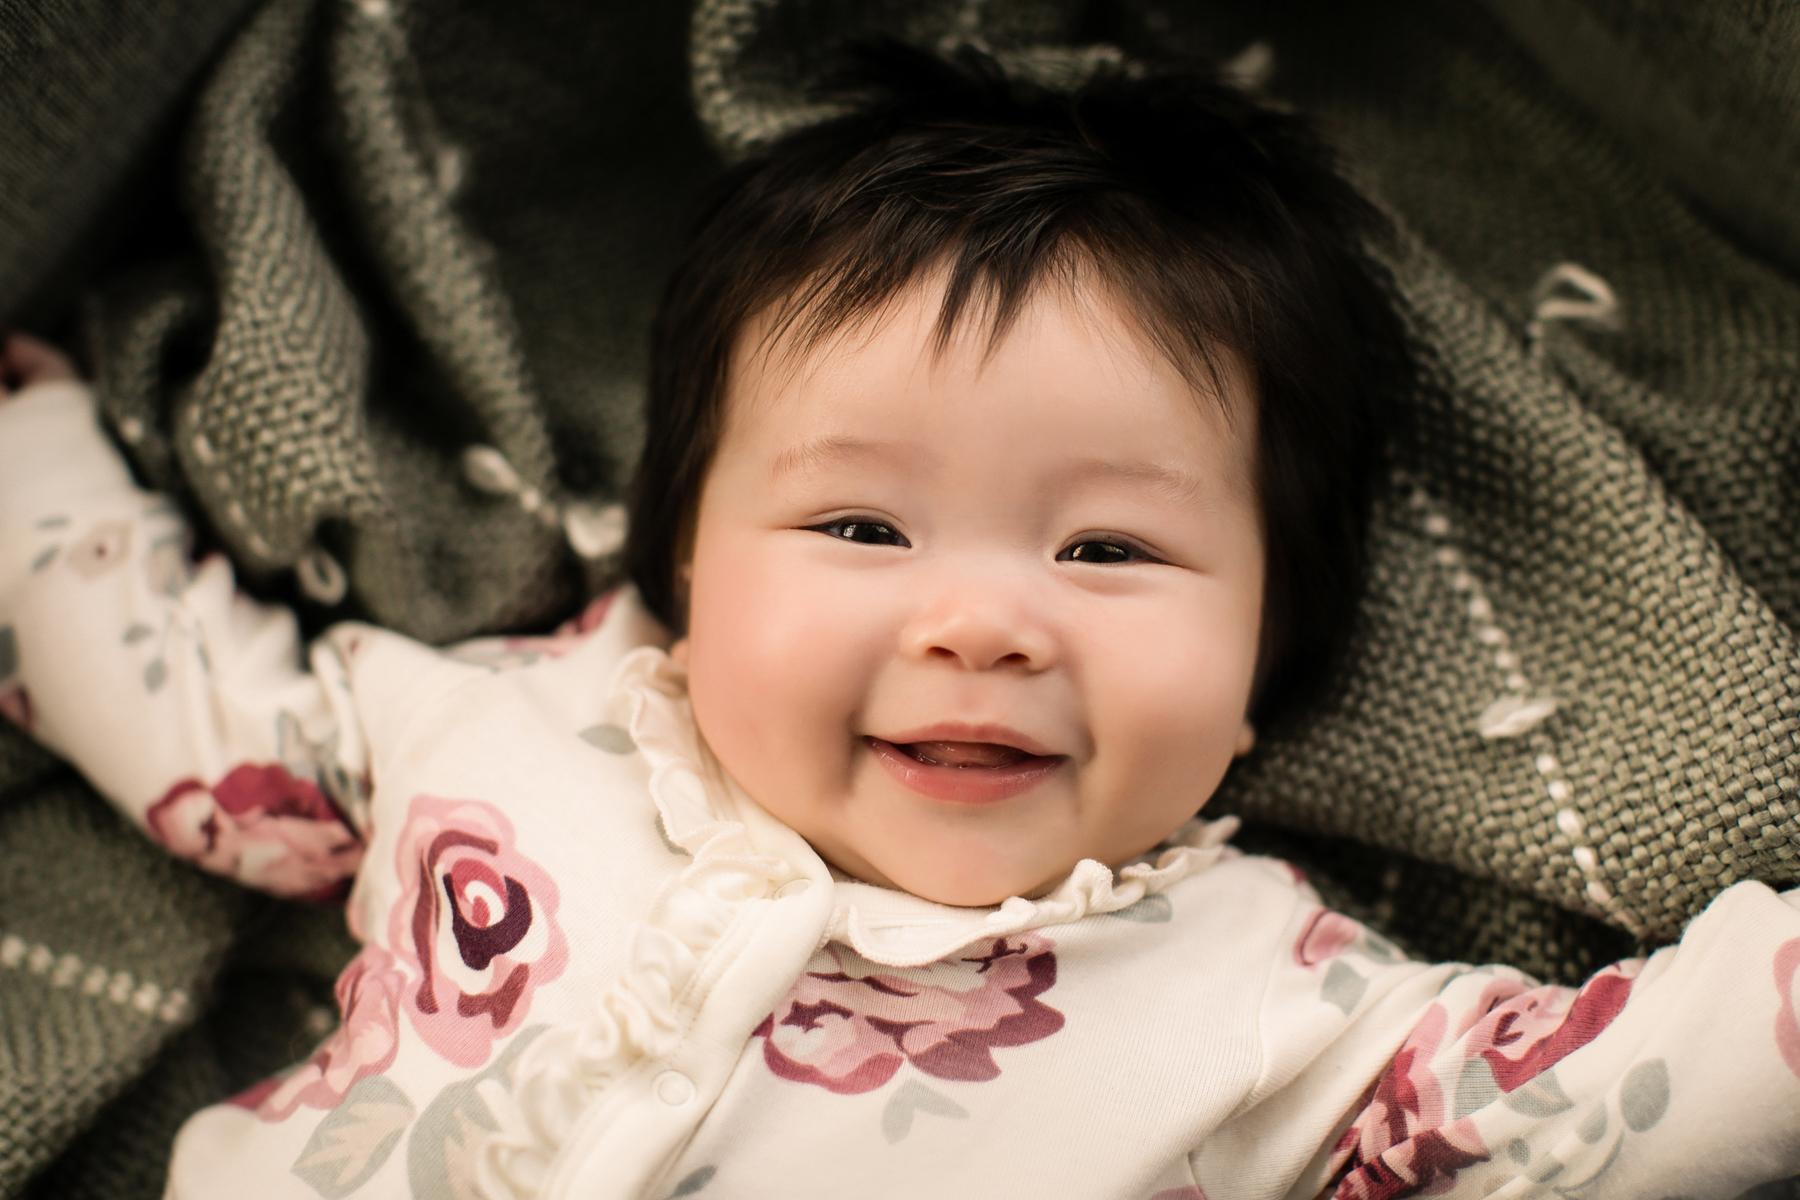 Chandler Newborn & Family Photography 04